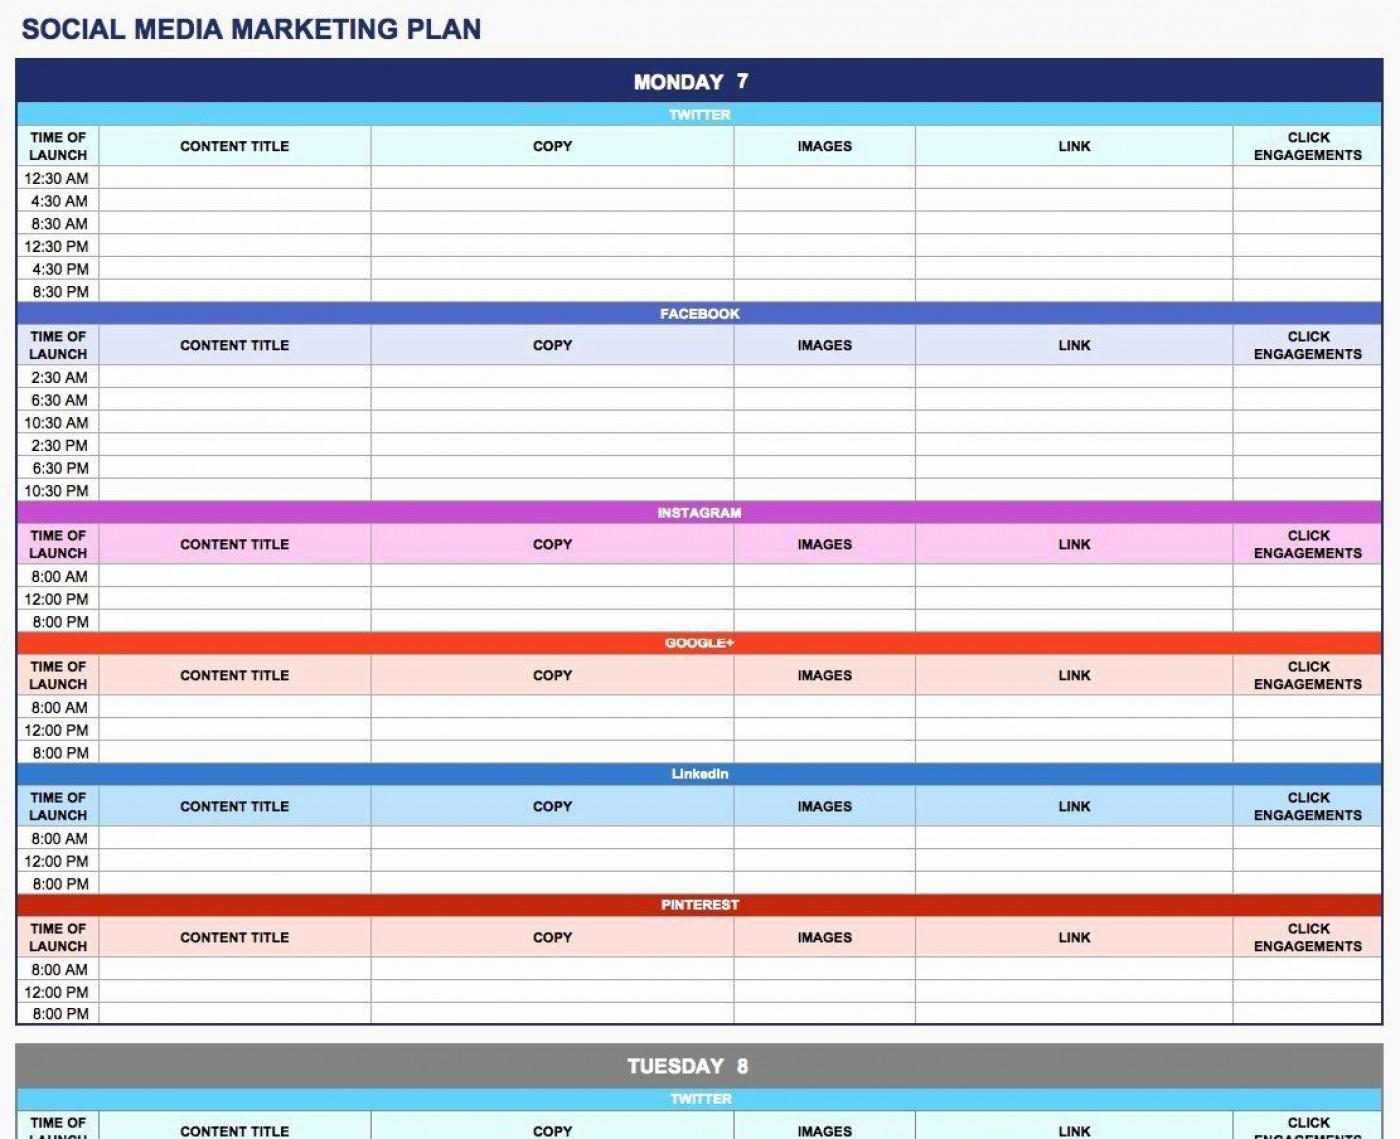 003 Rare Social Media Plan Template High Resolution  Doc Download Marketing Excel1400